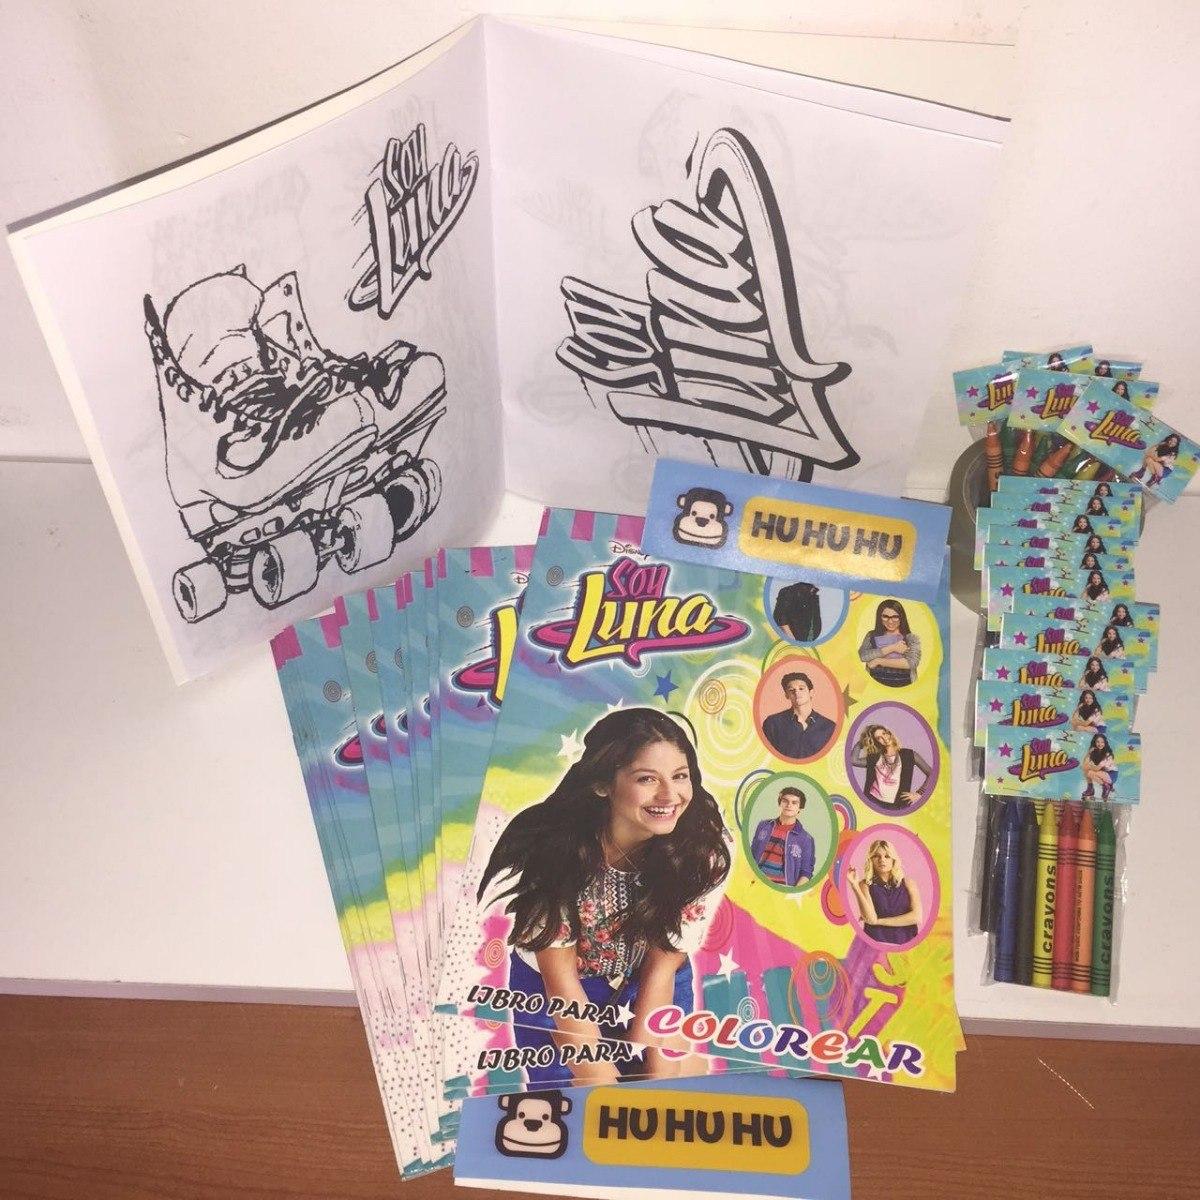 Soy Luna Libro Colorear O Crayolas Bolo Recuerdo